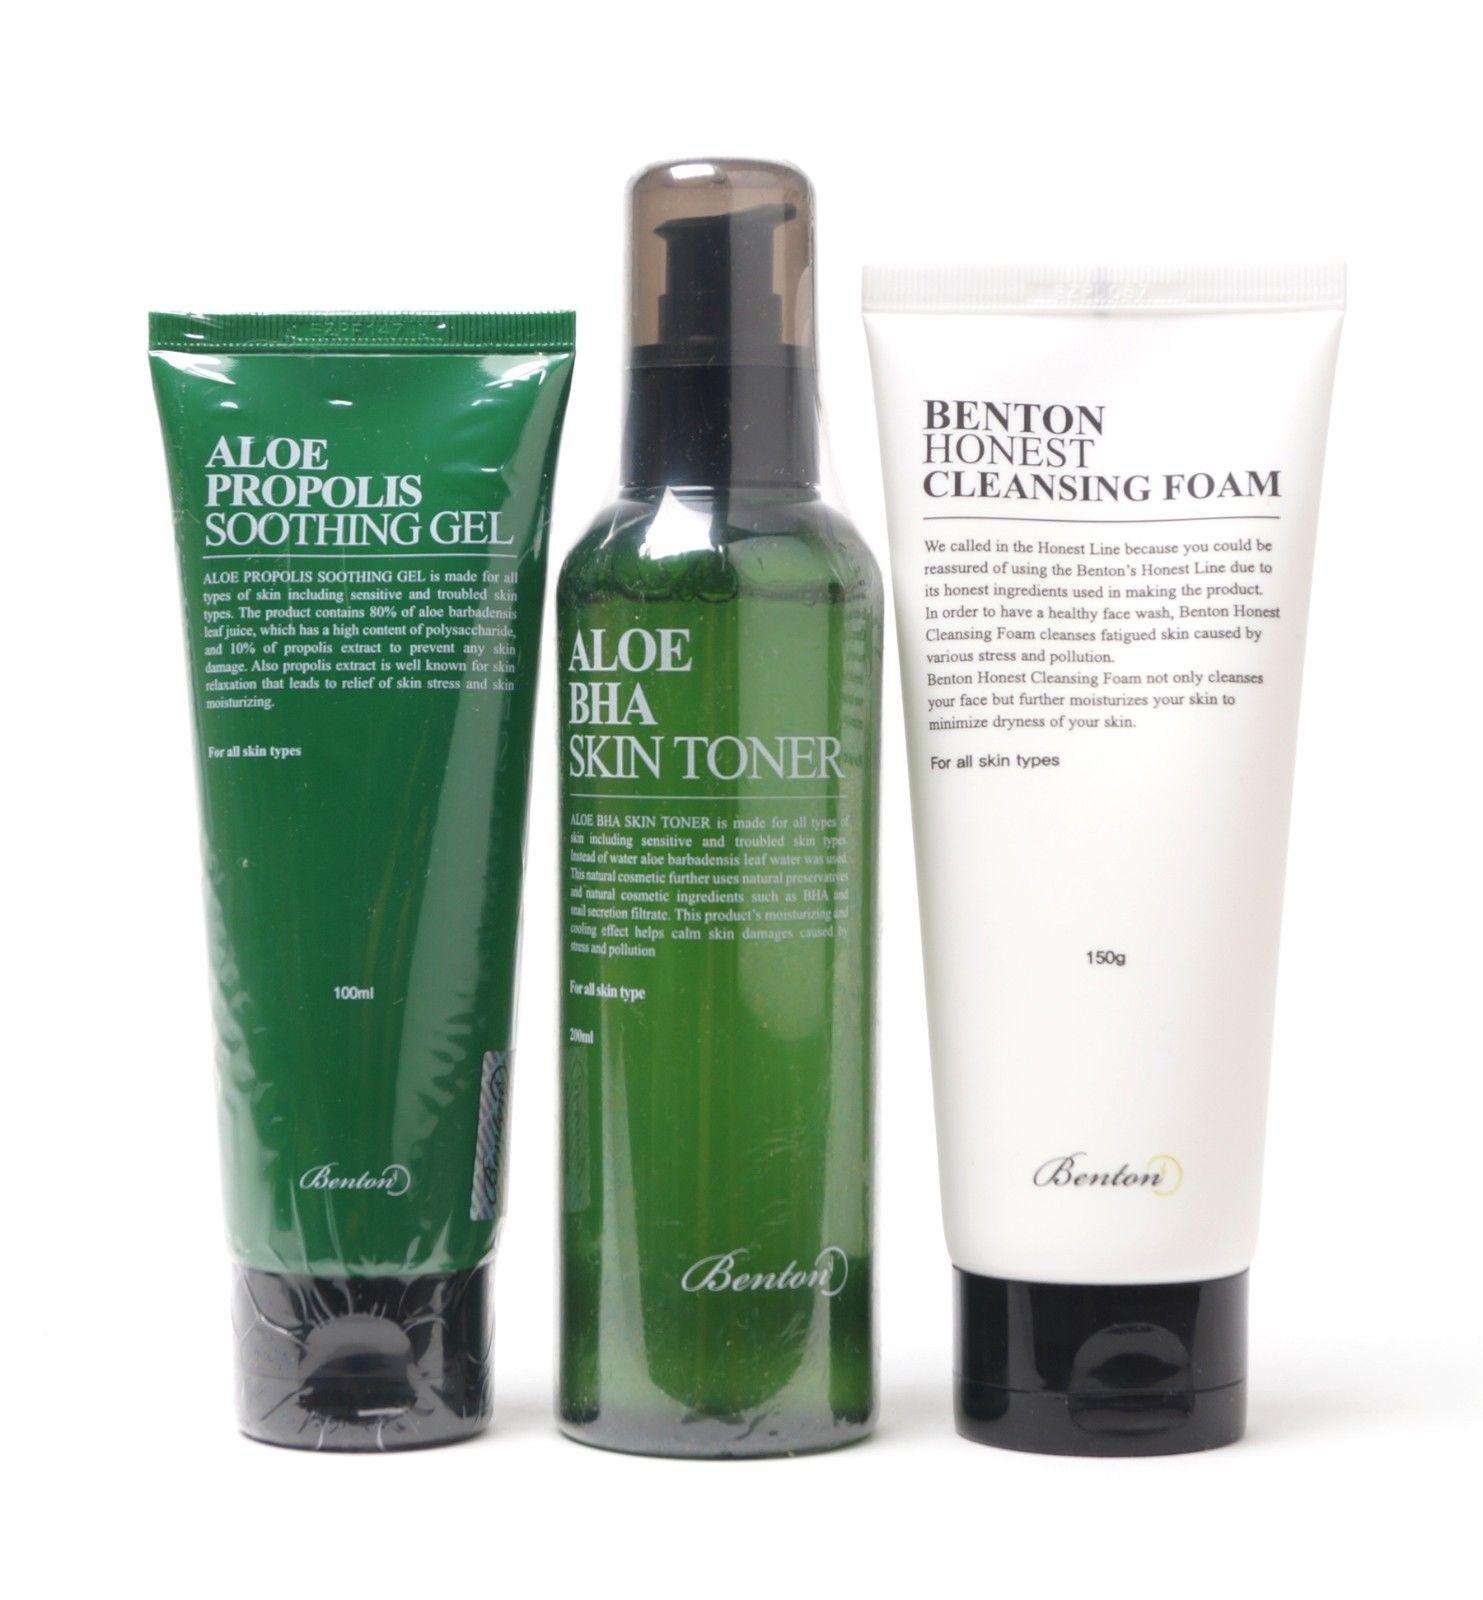 Benton Cosmetics ~ Aloe Propolis Soothing Gel, Aloe BHA Skin Toner, and Honest Cleansing Foam